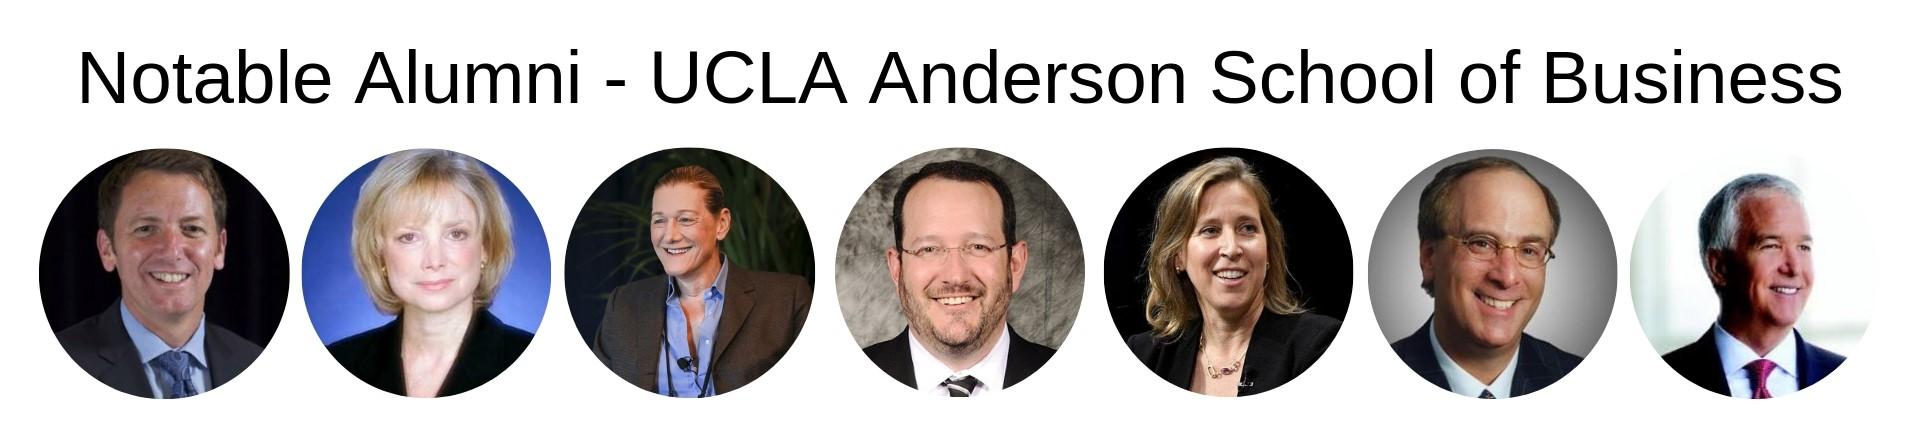 UCLA Anderson School of Management - Notable Alumni